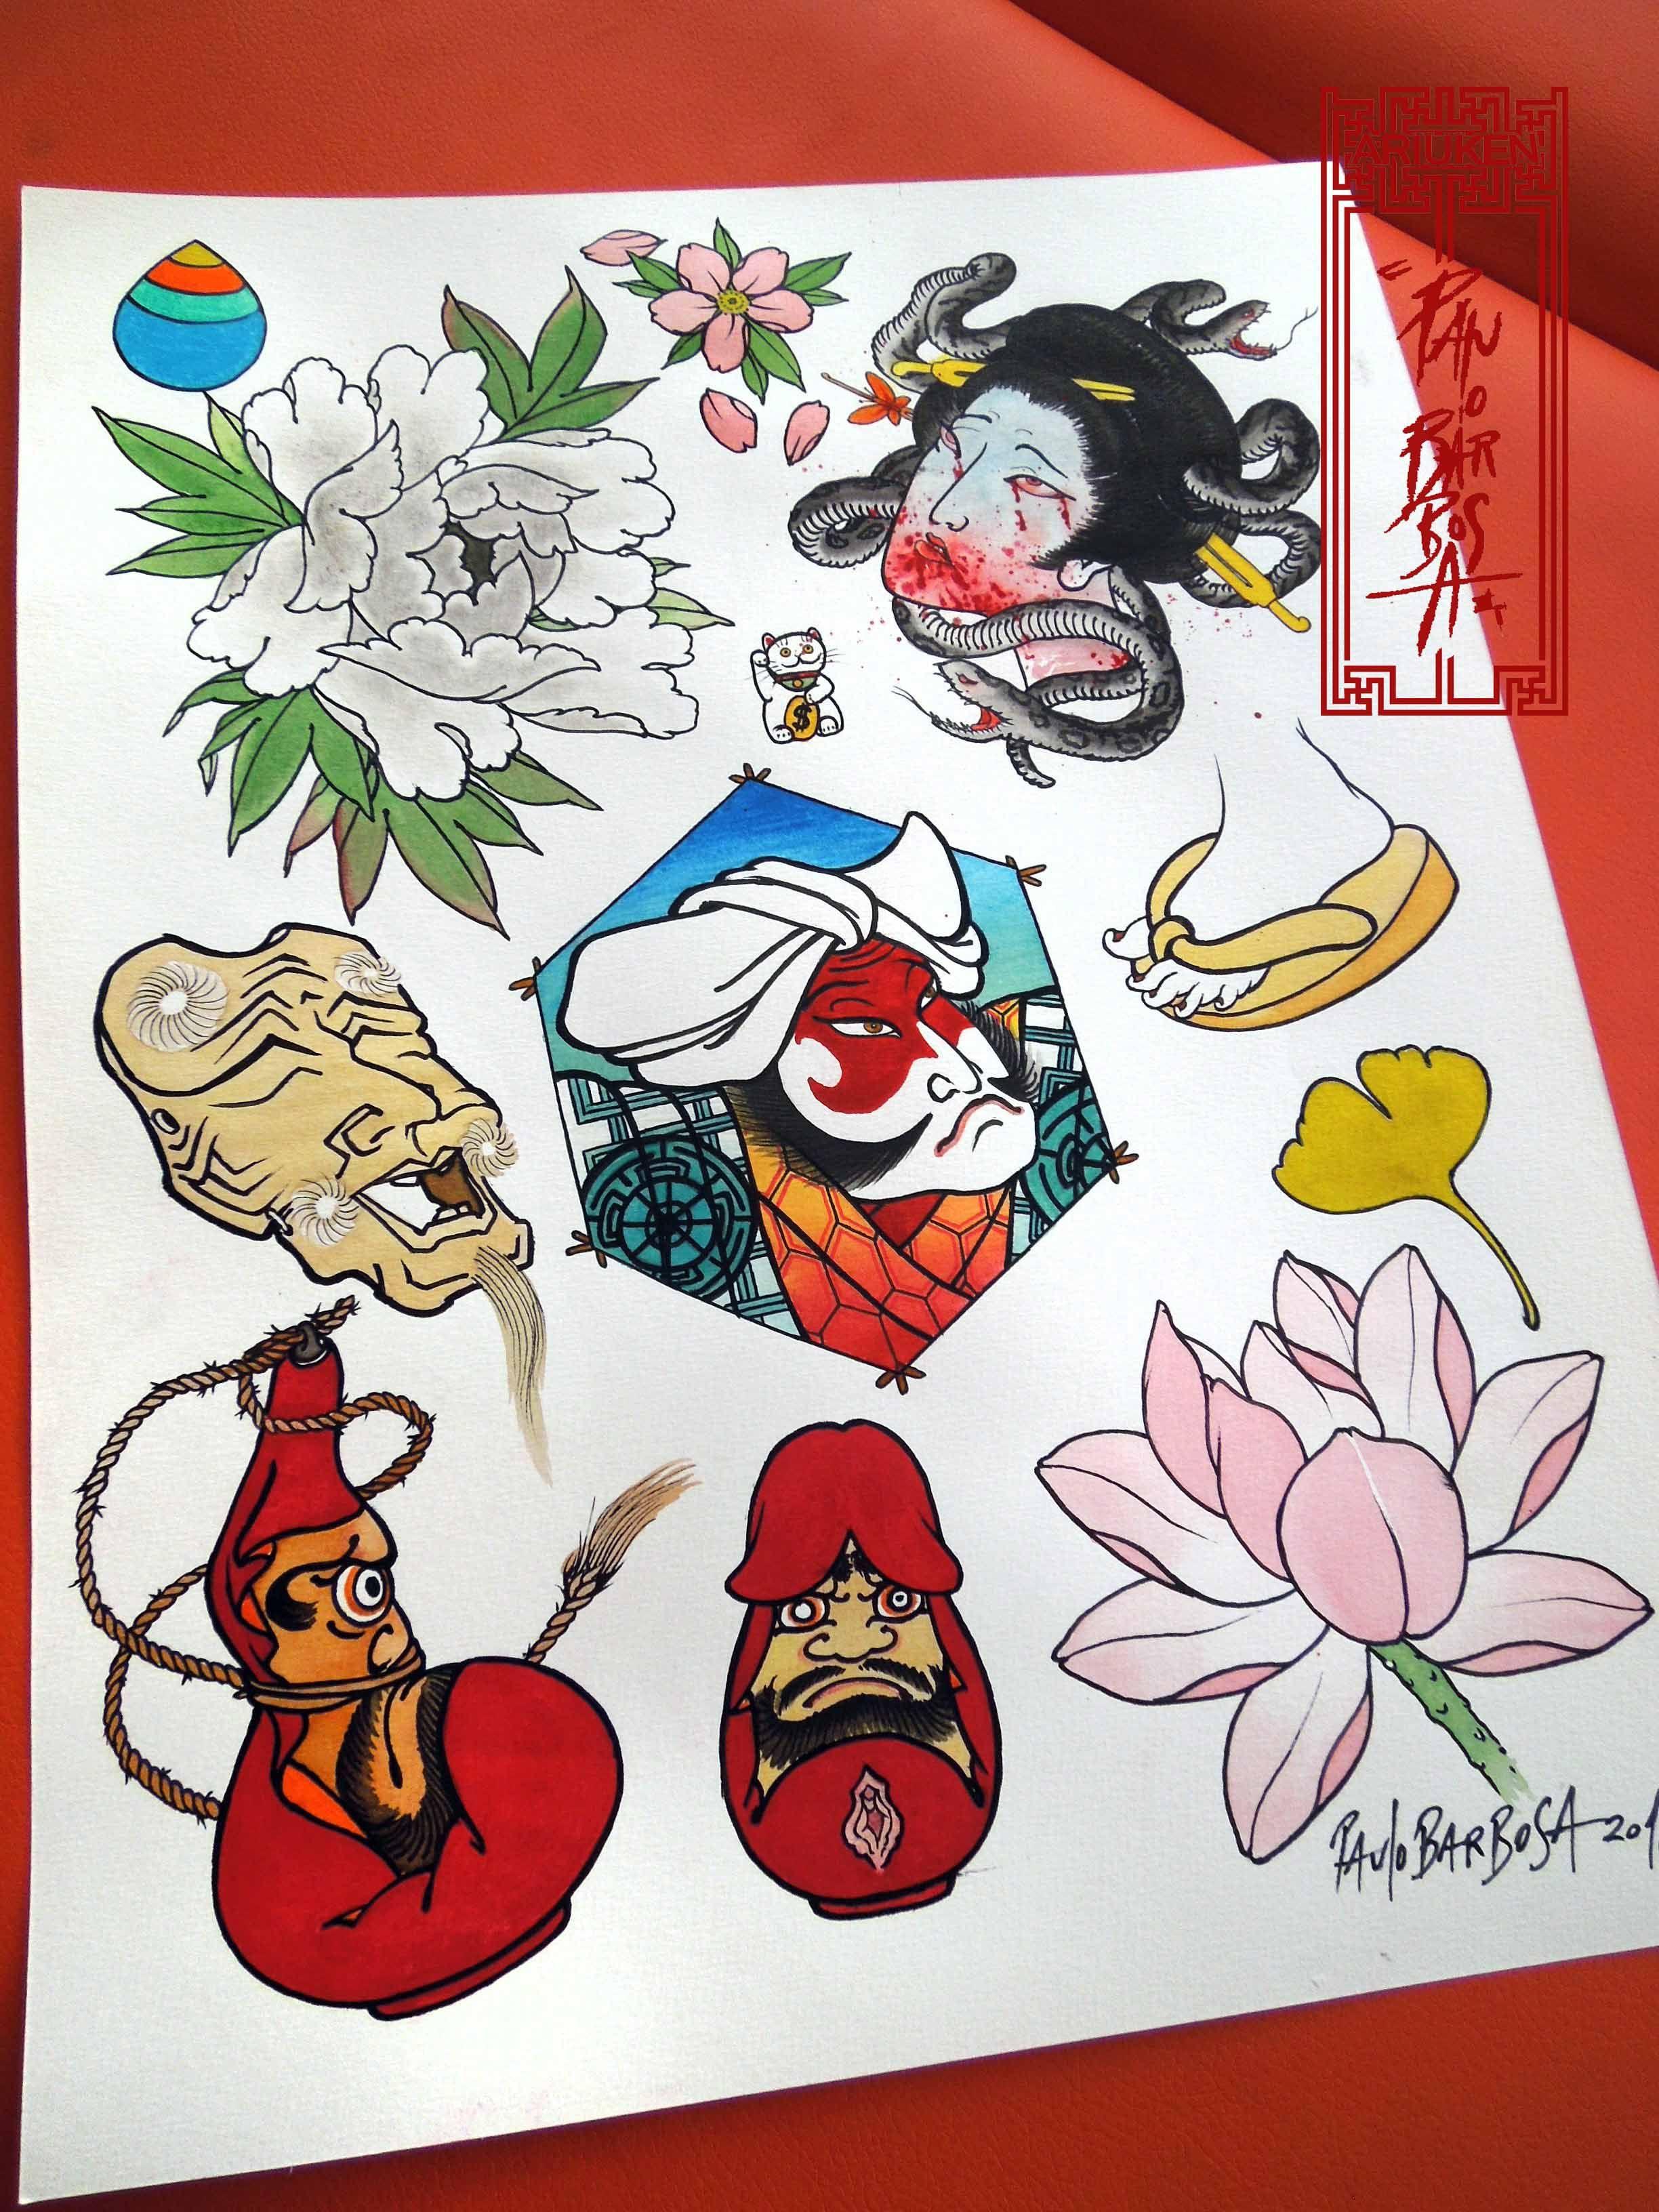 Tattoo flash art by paulo barbosa ariuken art on for Japanese tattoo flash